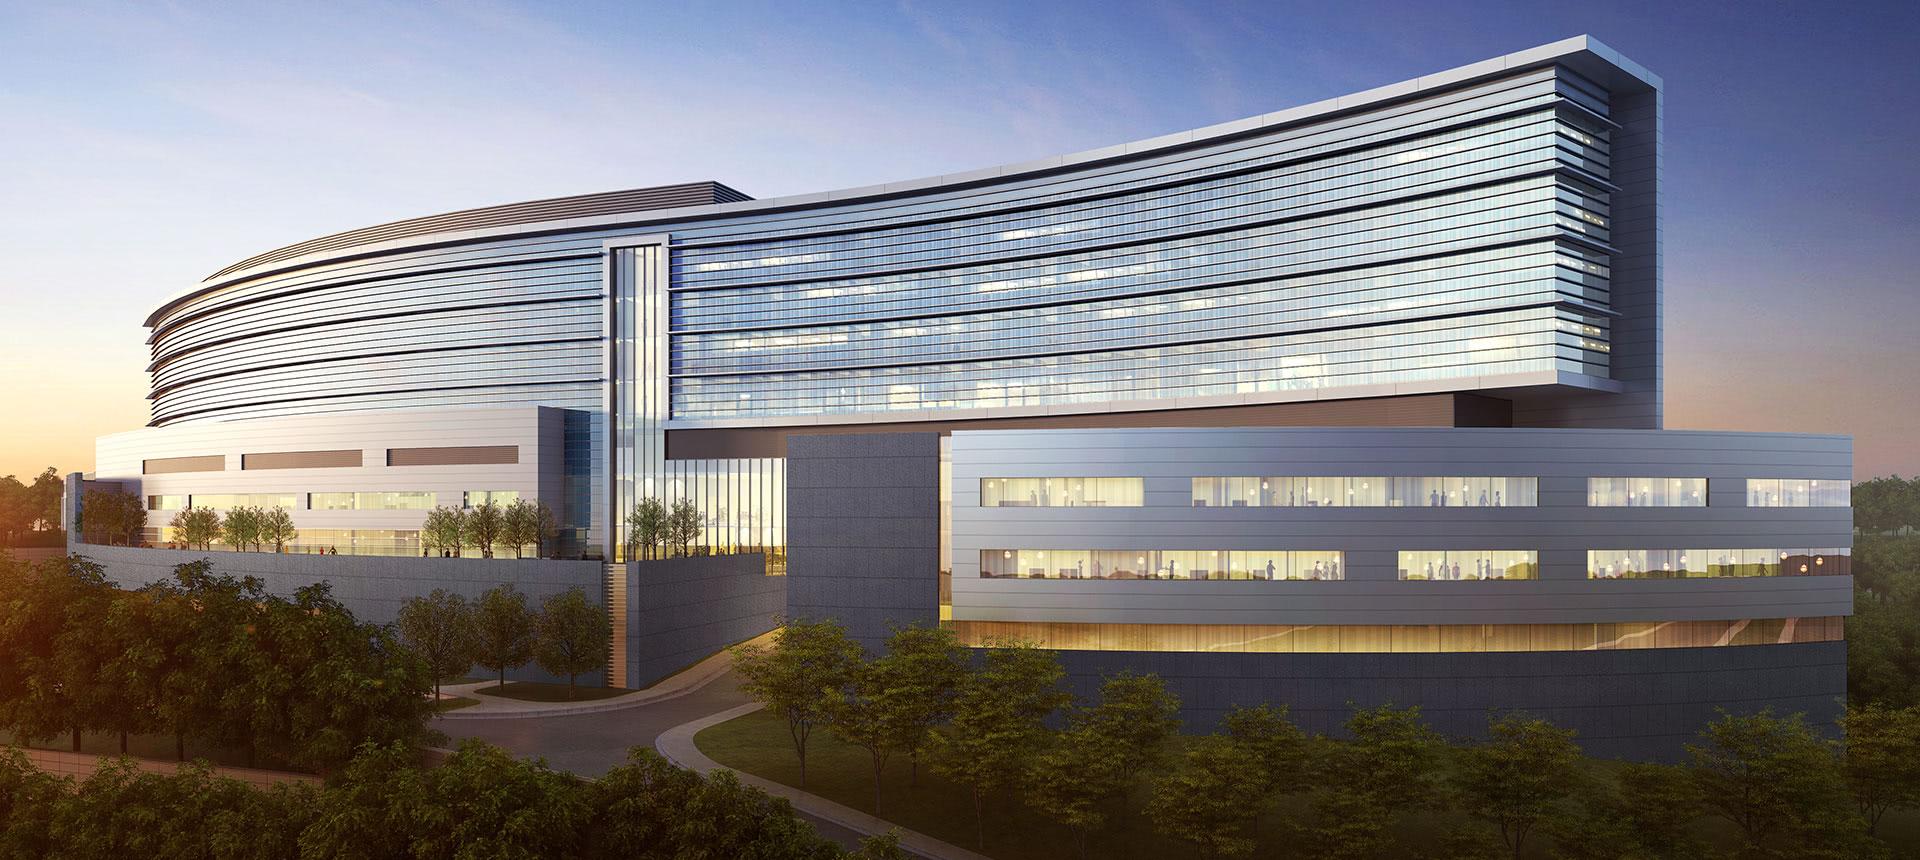 Vassar Brothers Medical Center Expansion